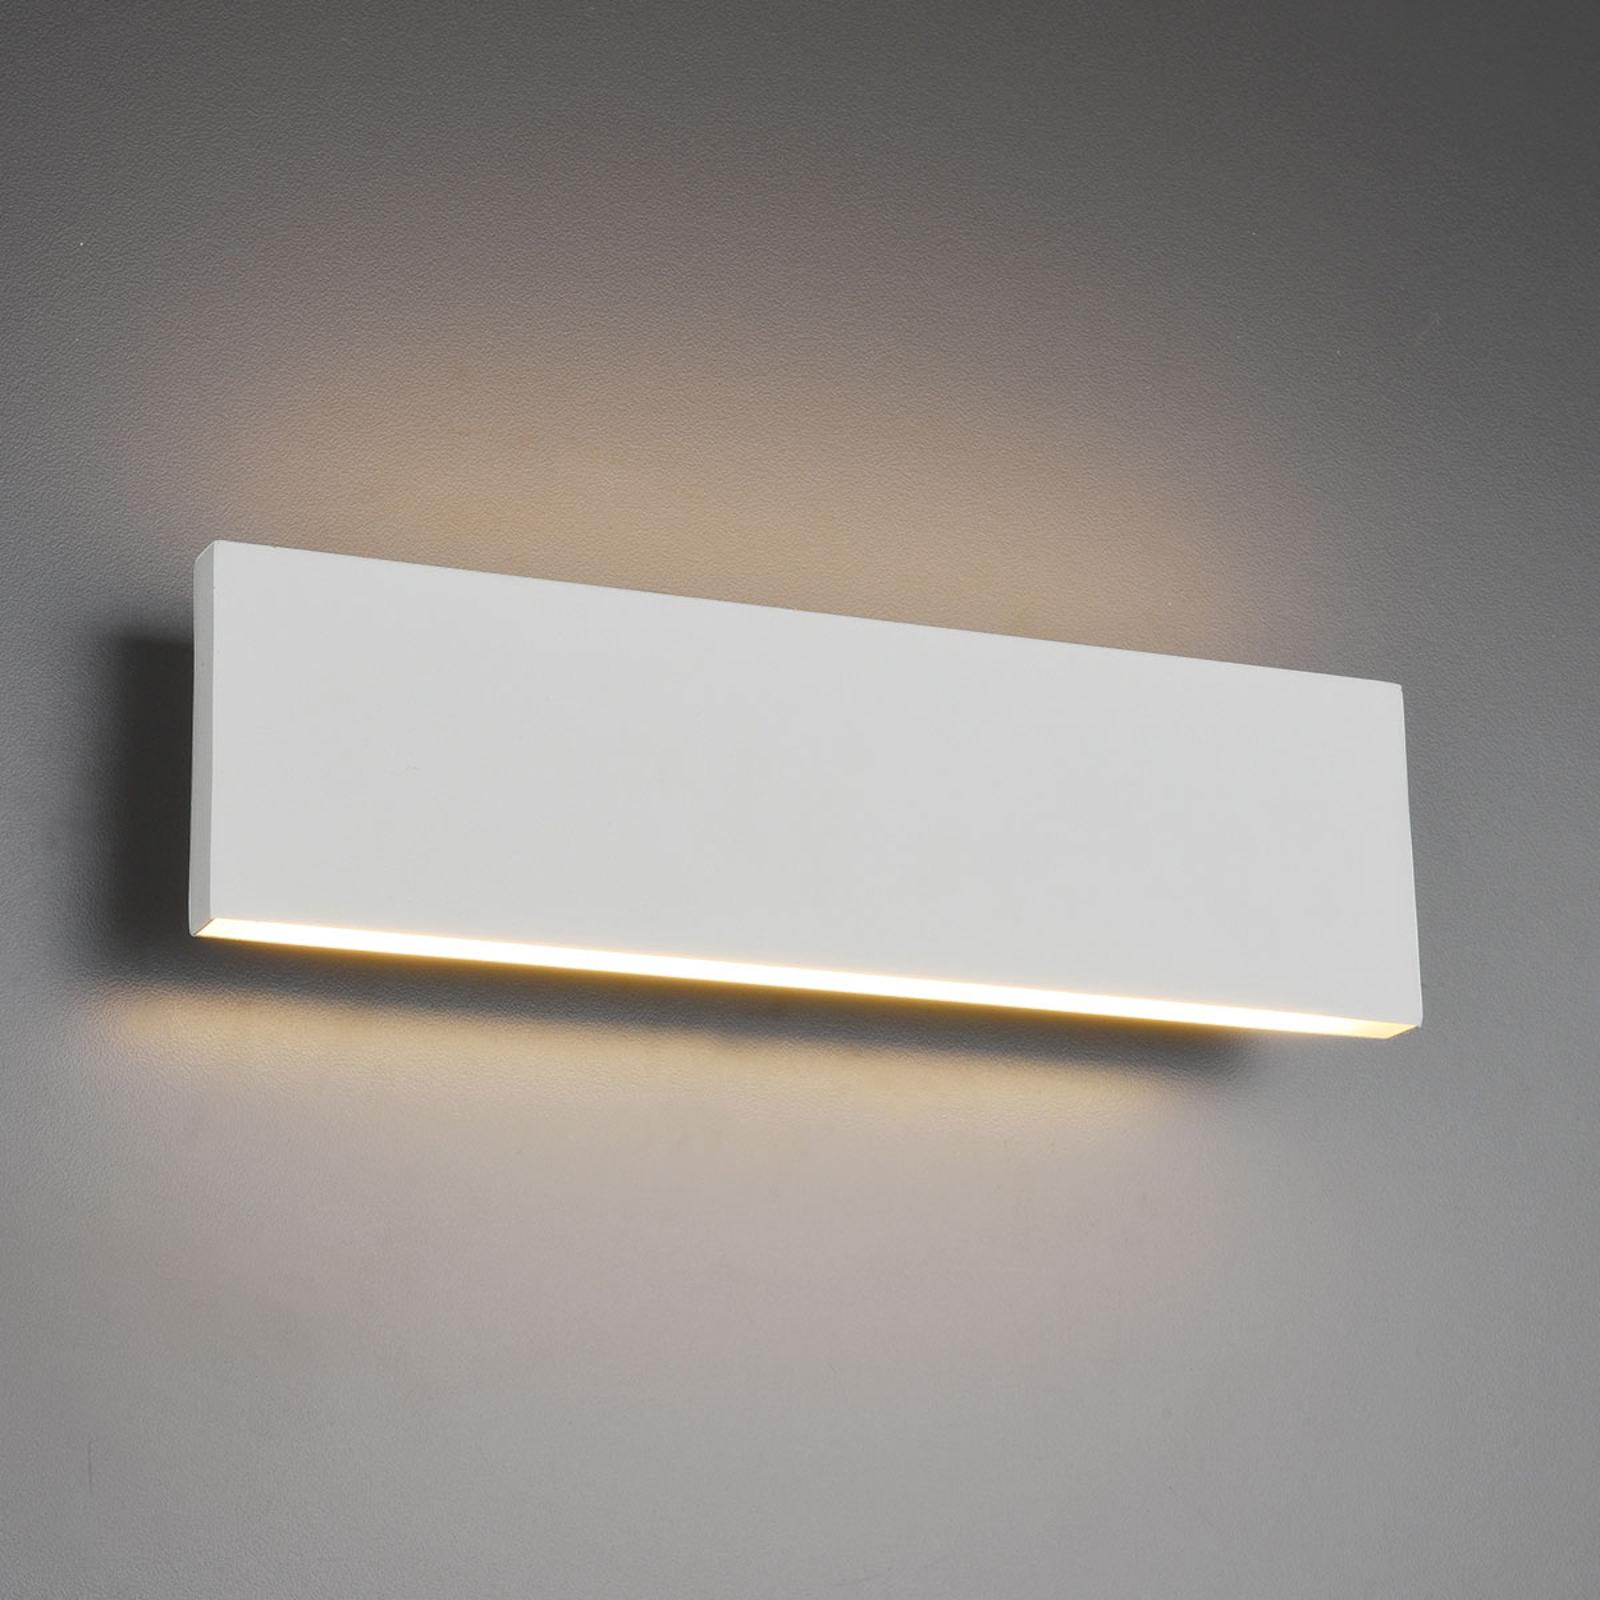 LED-Wandlampe Concha 28 cm, weiß